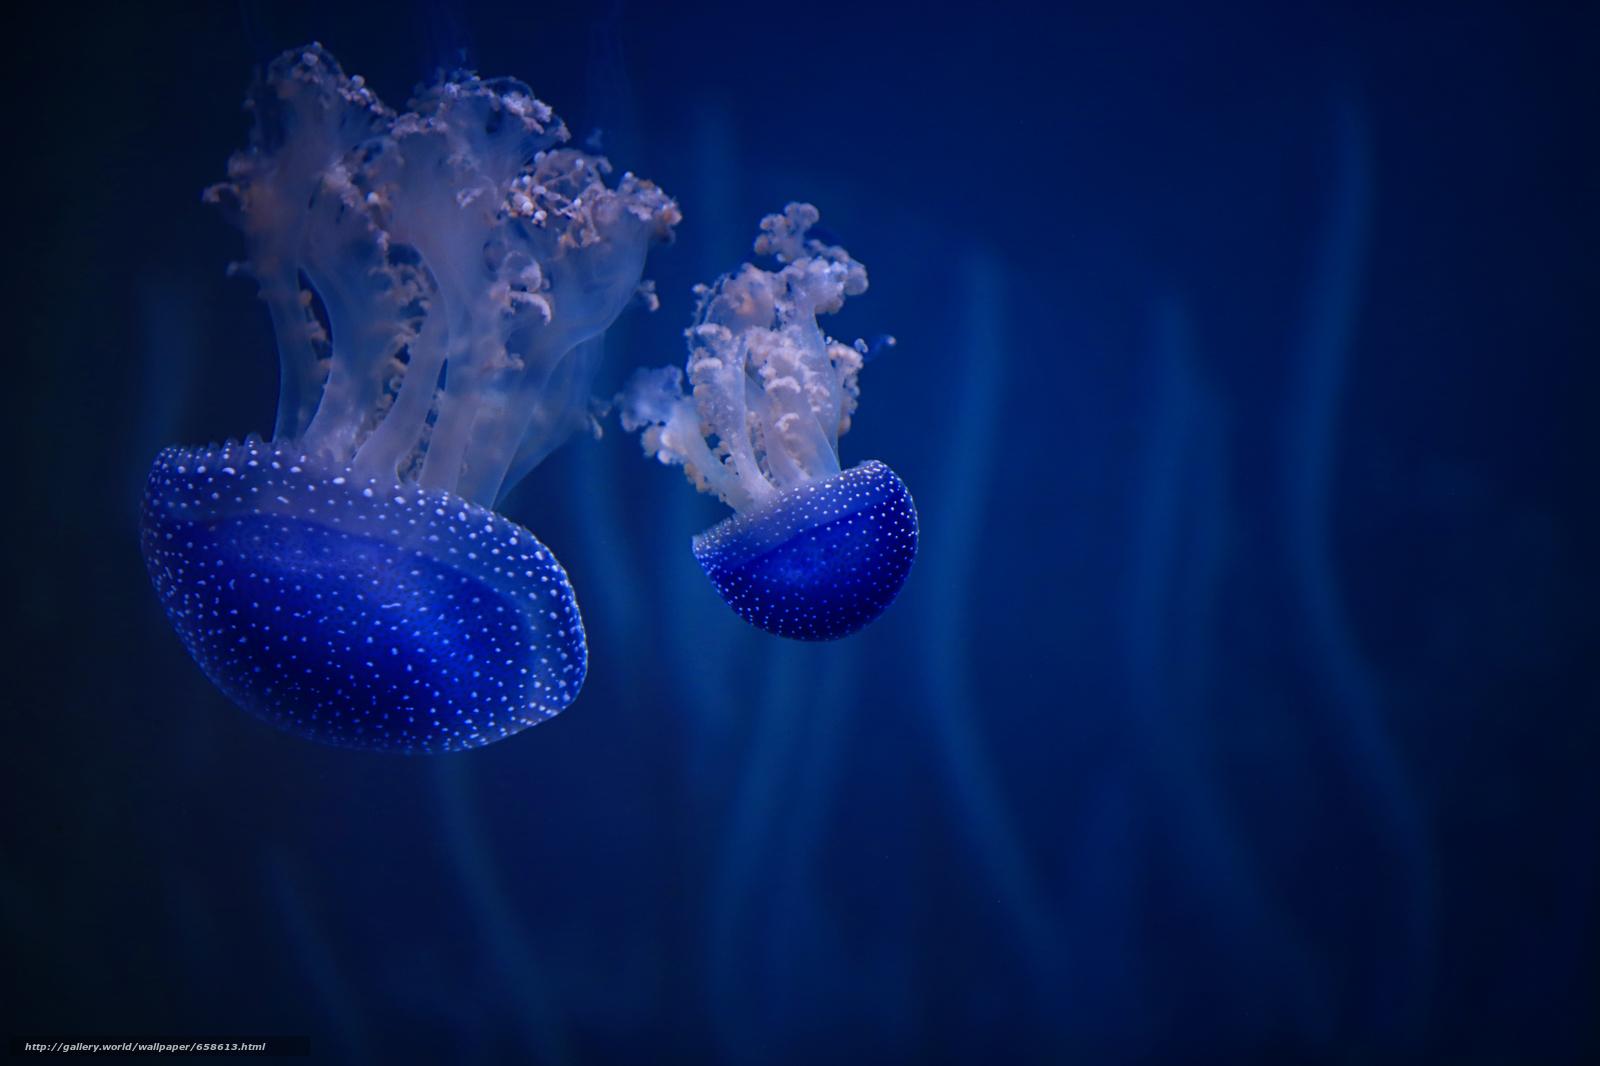 Descargar gratis medusa,  Medusa,  Mundial de Actividades Subacuáticas,  agua Fondos de escritorio en la resolucin 4000x2666 — imagen №658613